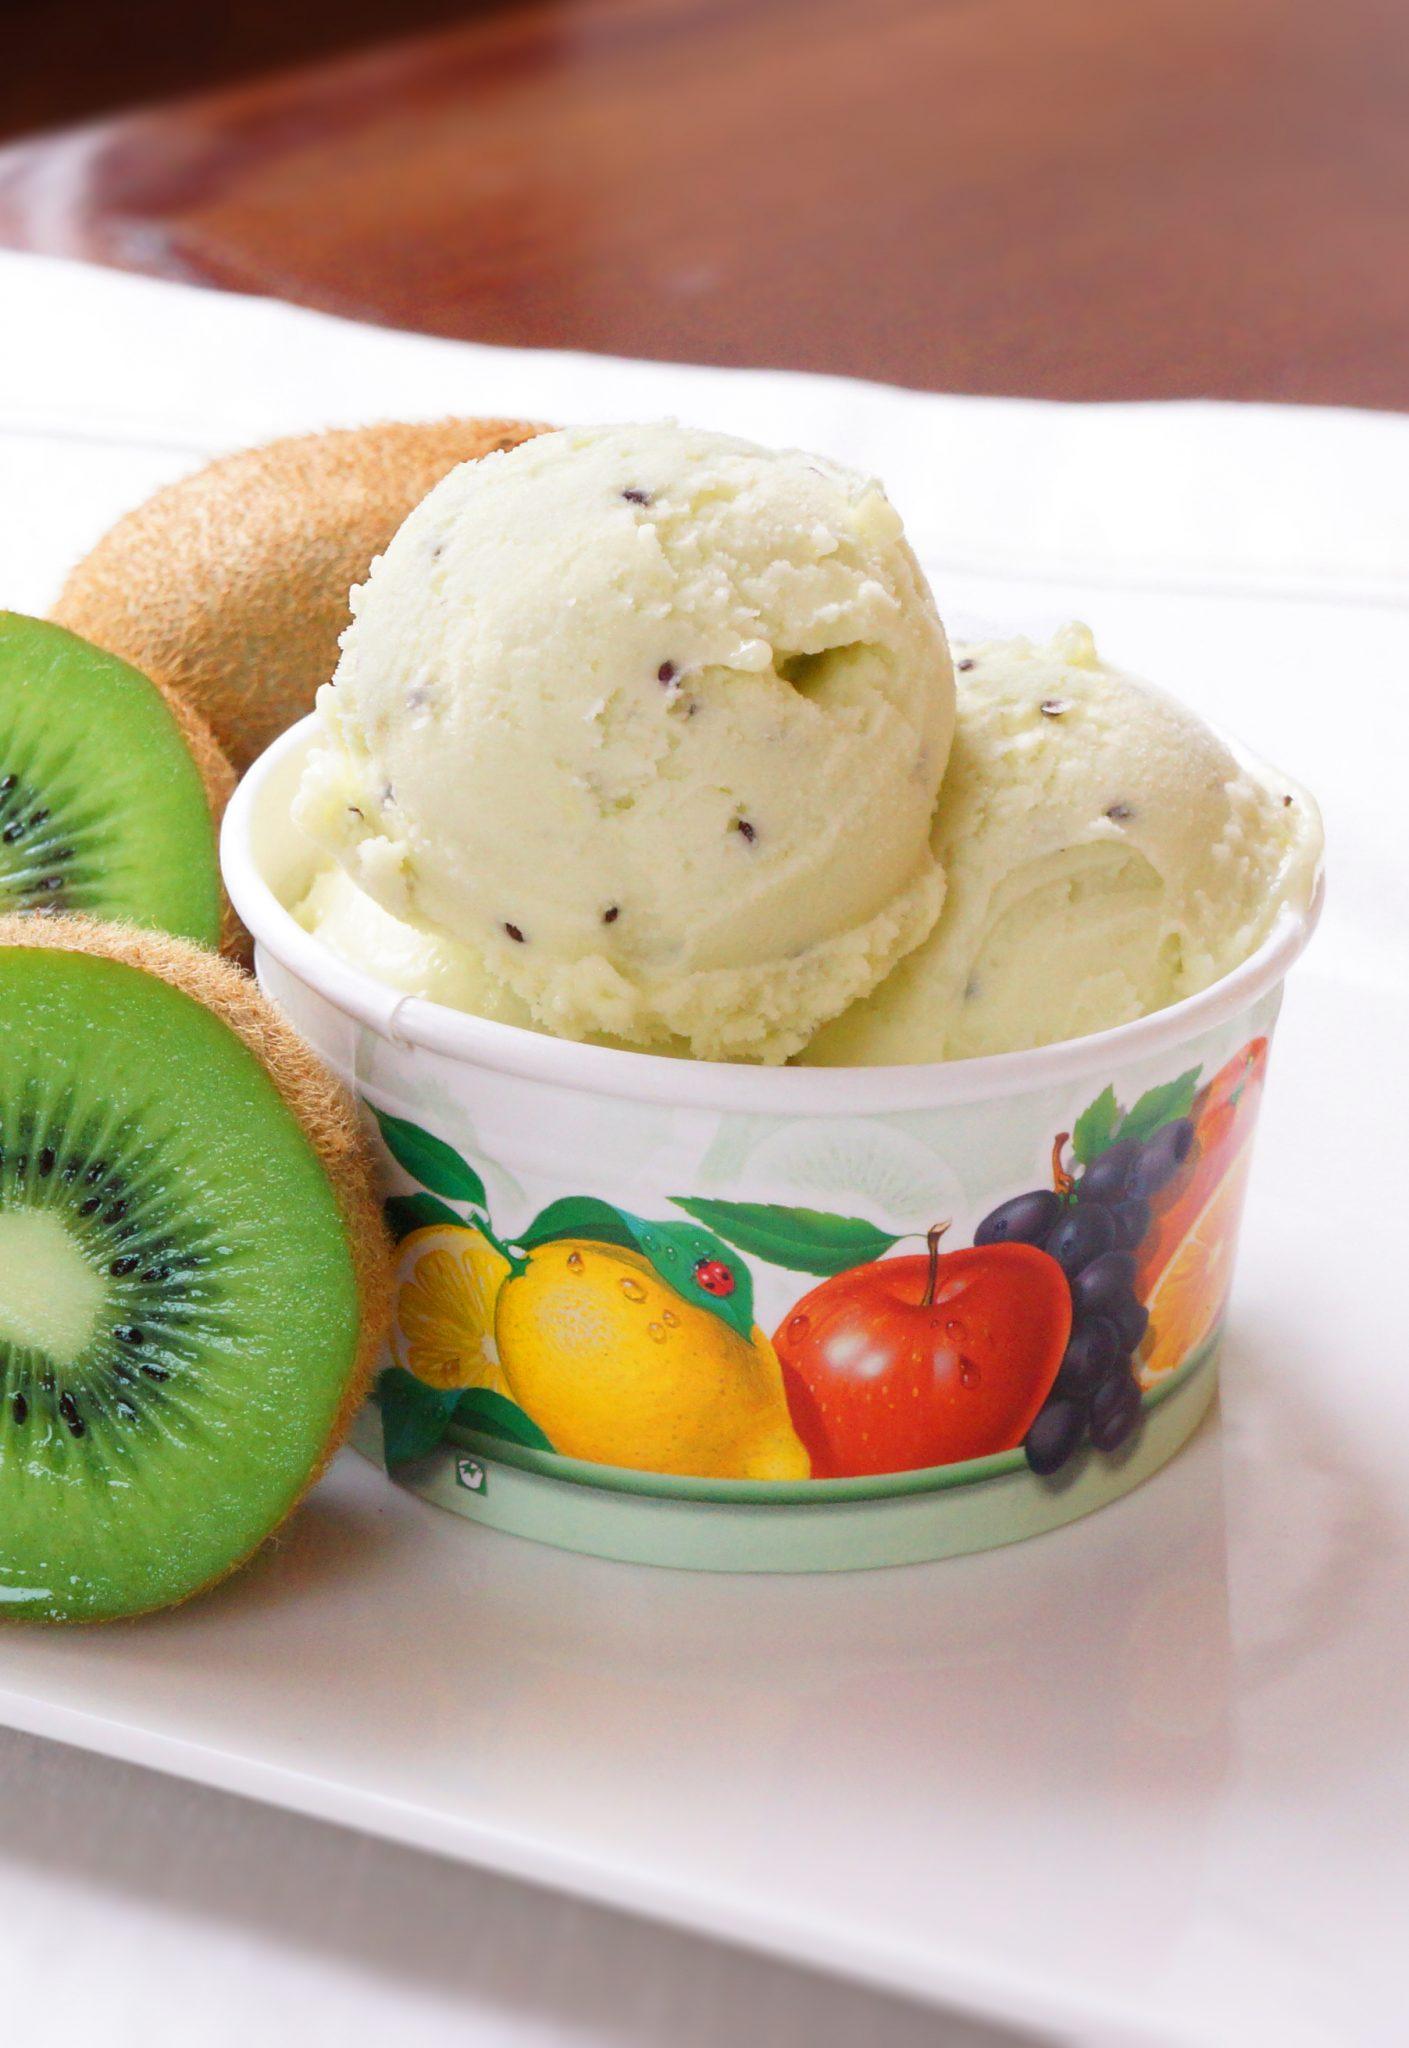 Sorbet Kiwi, lody o smaku kiwi